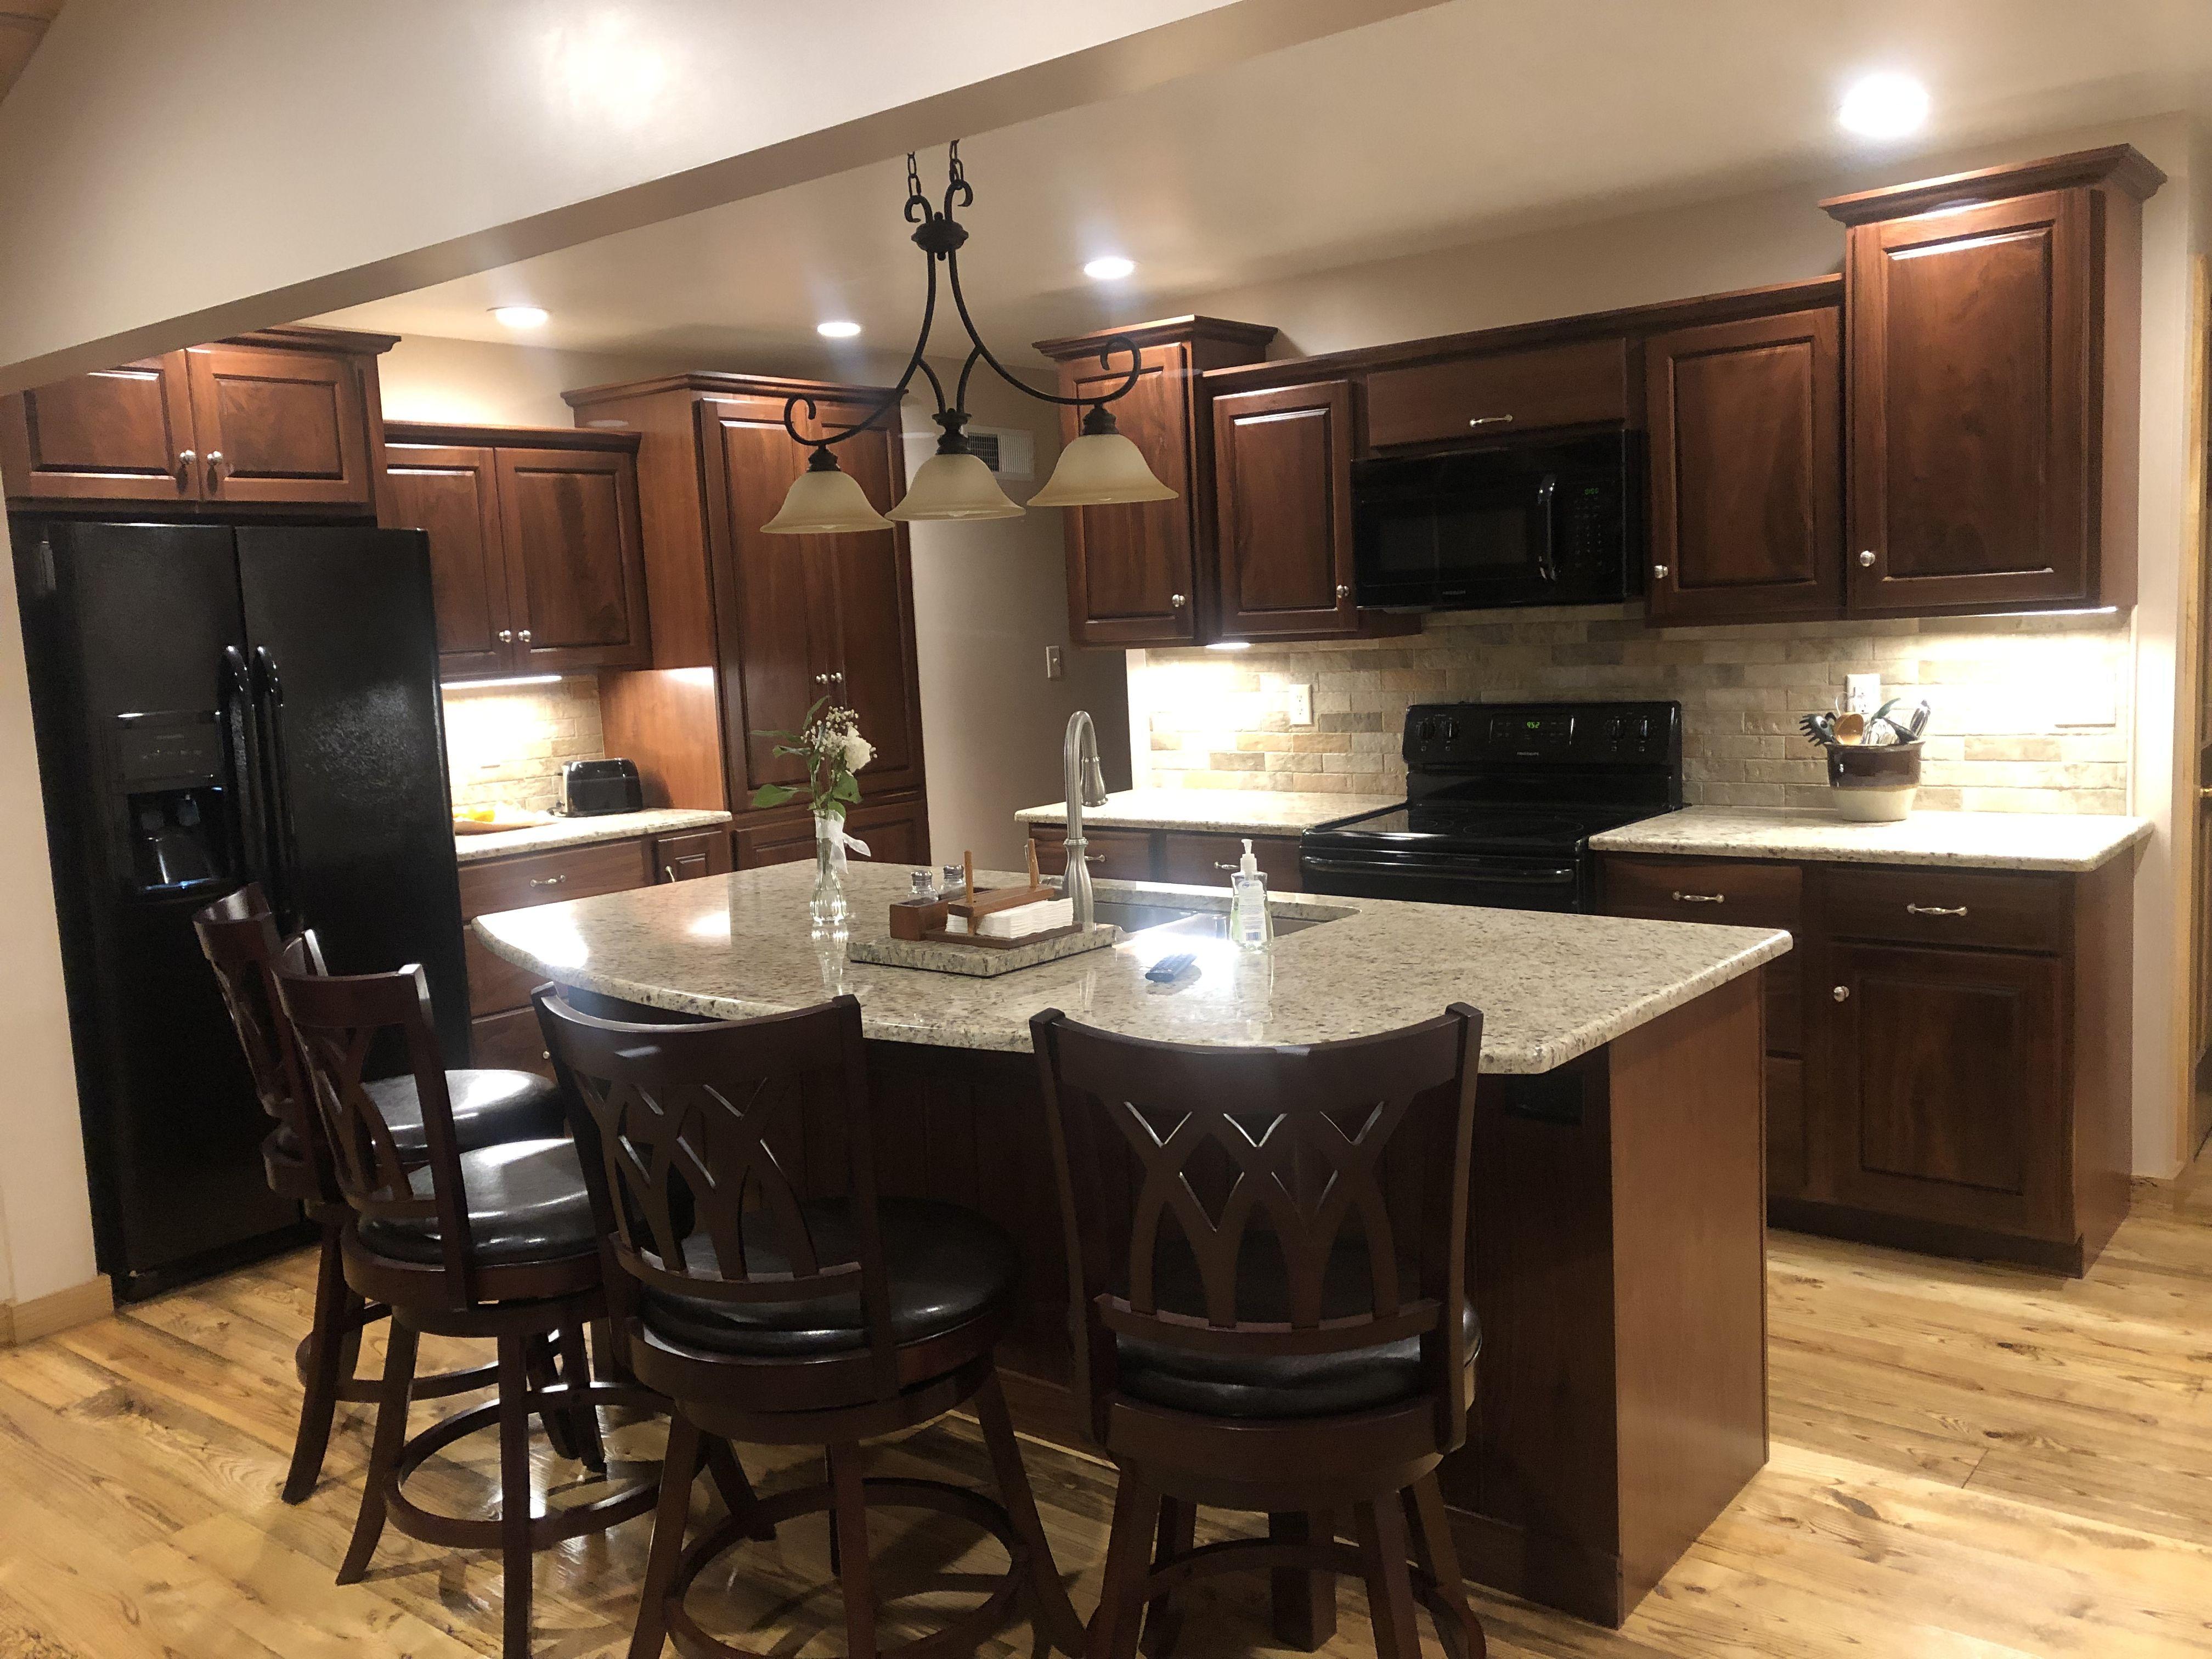 Walnut cabinets Ash hardwood floors (With images ...